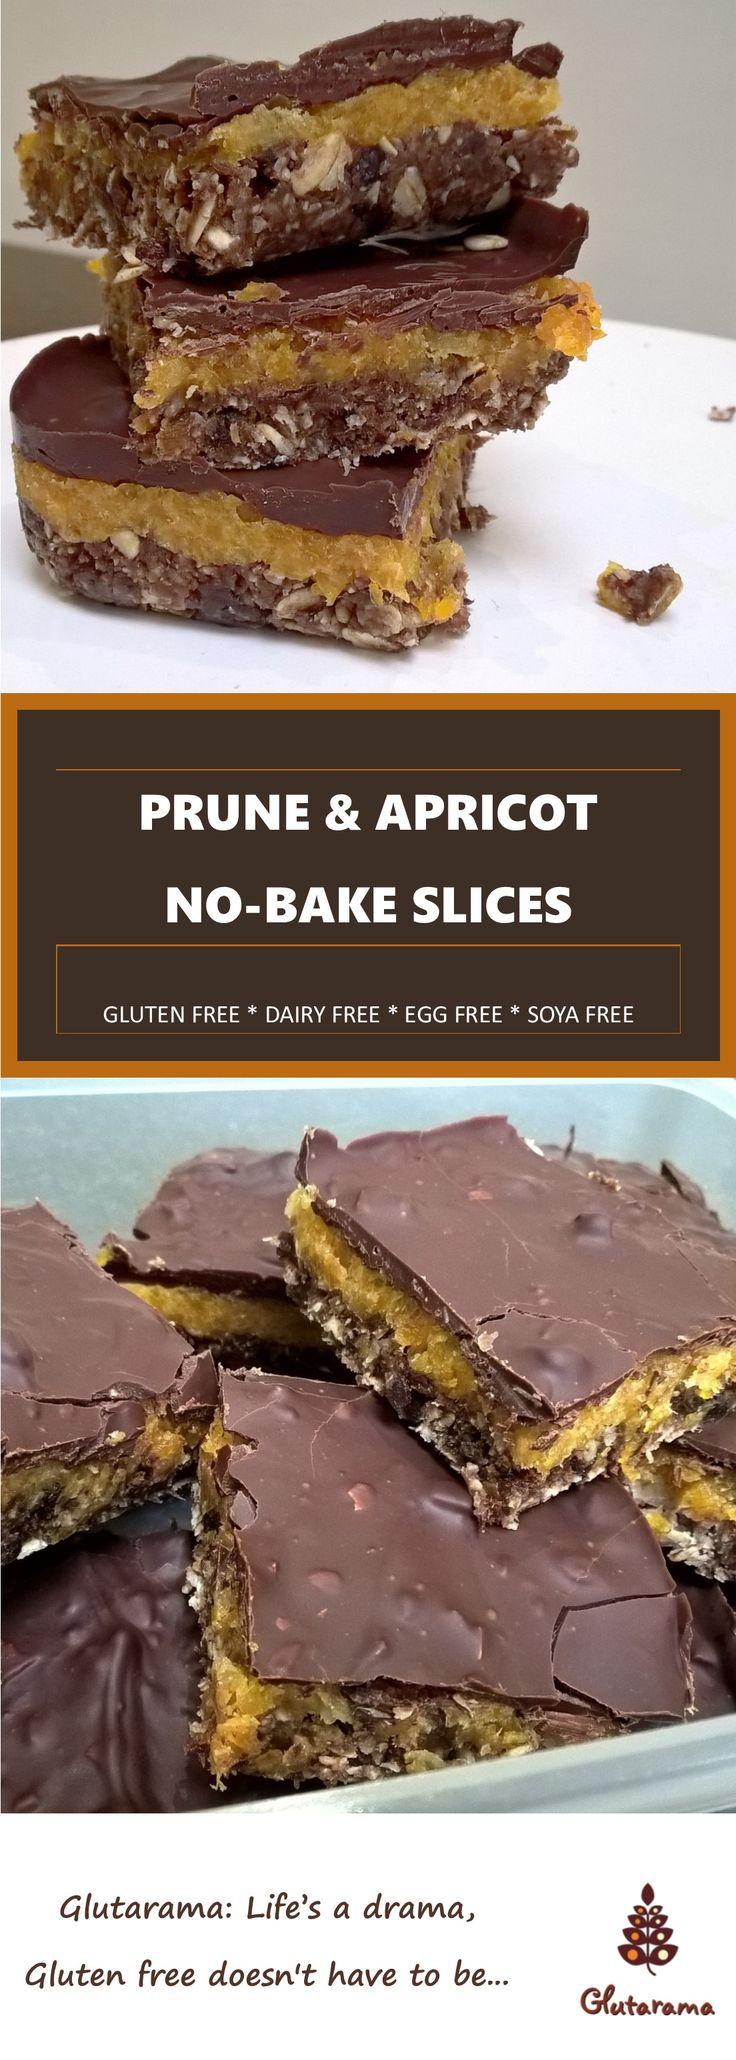 Prune & Apricot Slice (gluten, dairy, egg free) - Glutarama